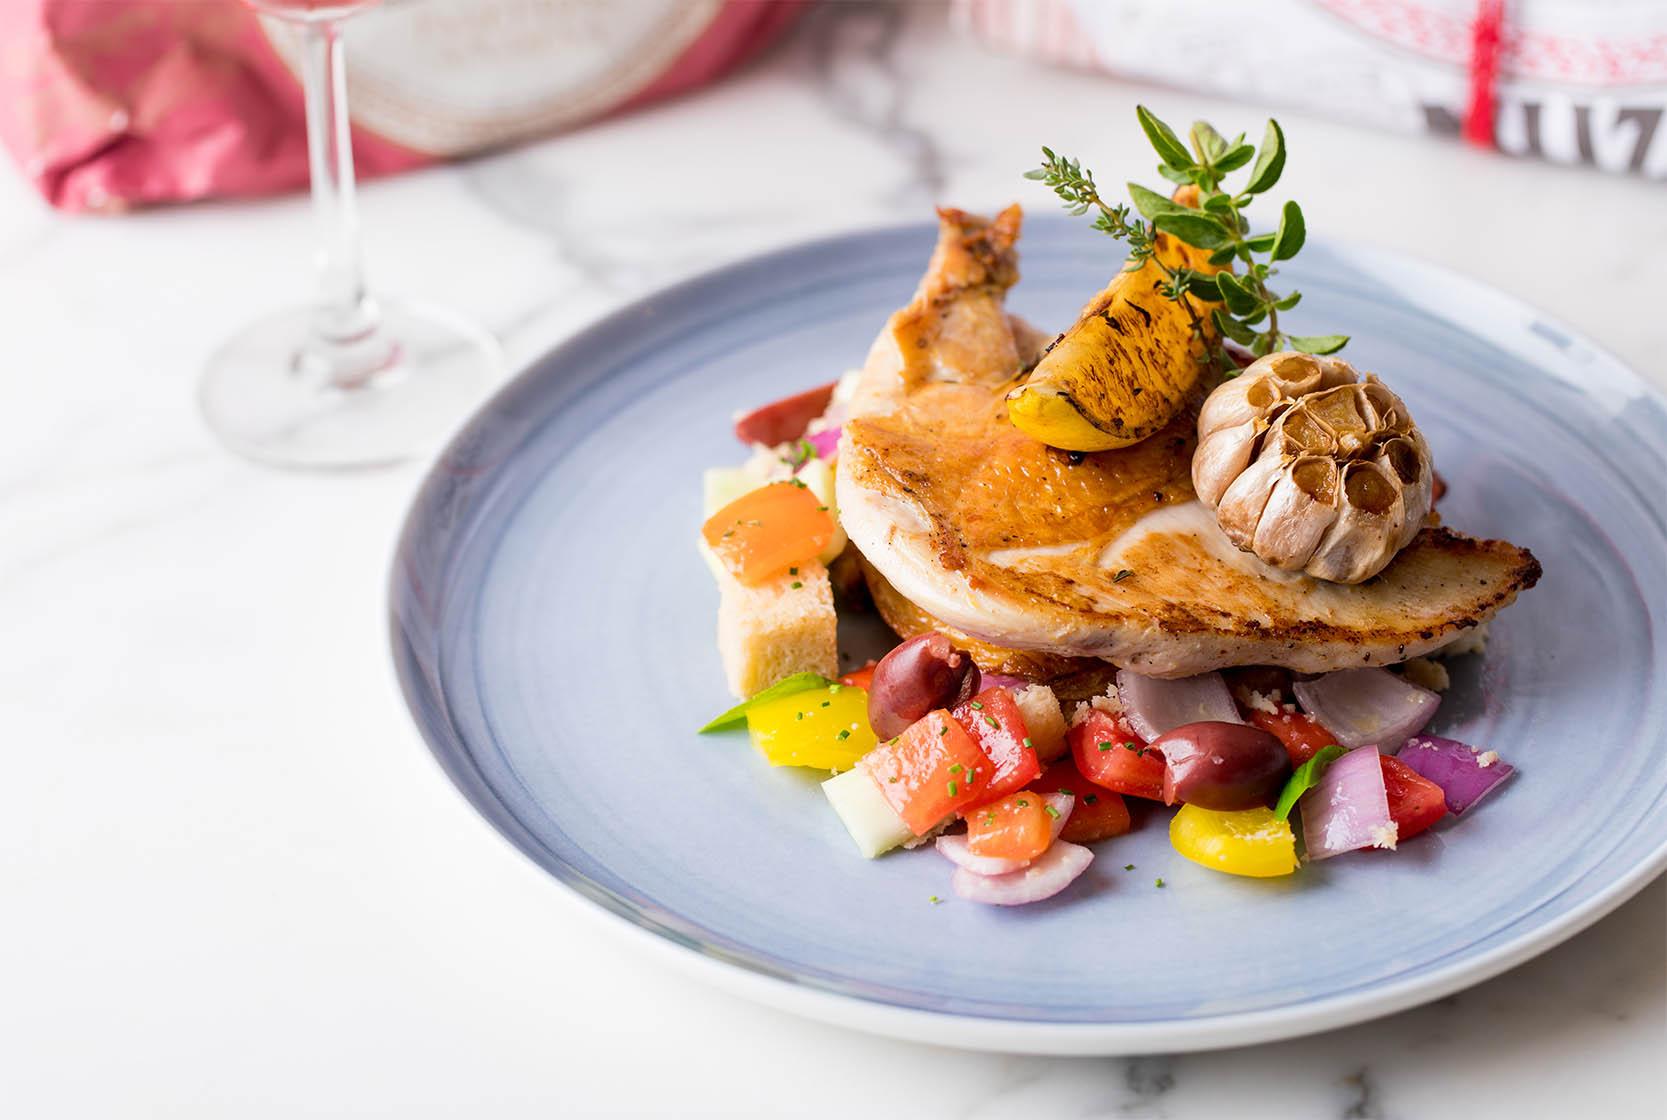 CinCin, Cuisine, Dine, Food, Italian, Meal, Mumbai, Restaurant, Verve Gourmand, Wine